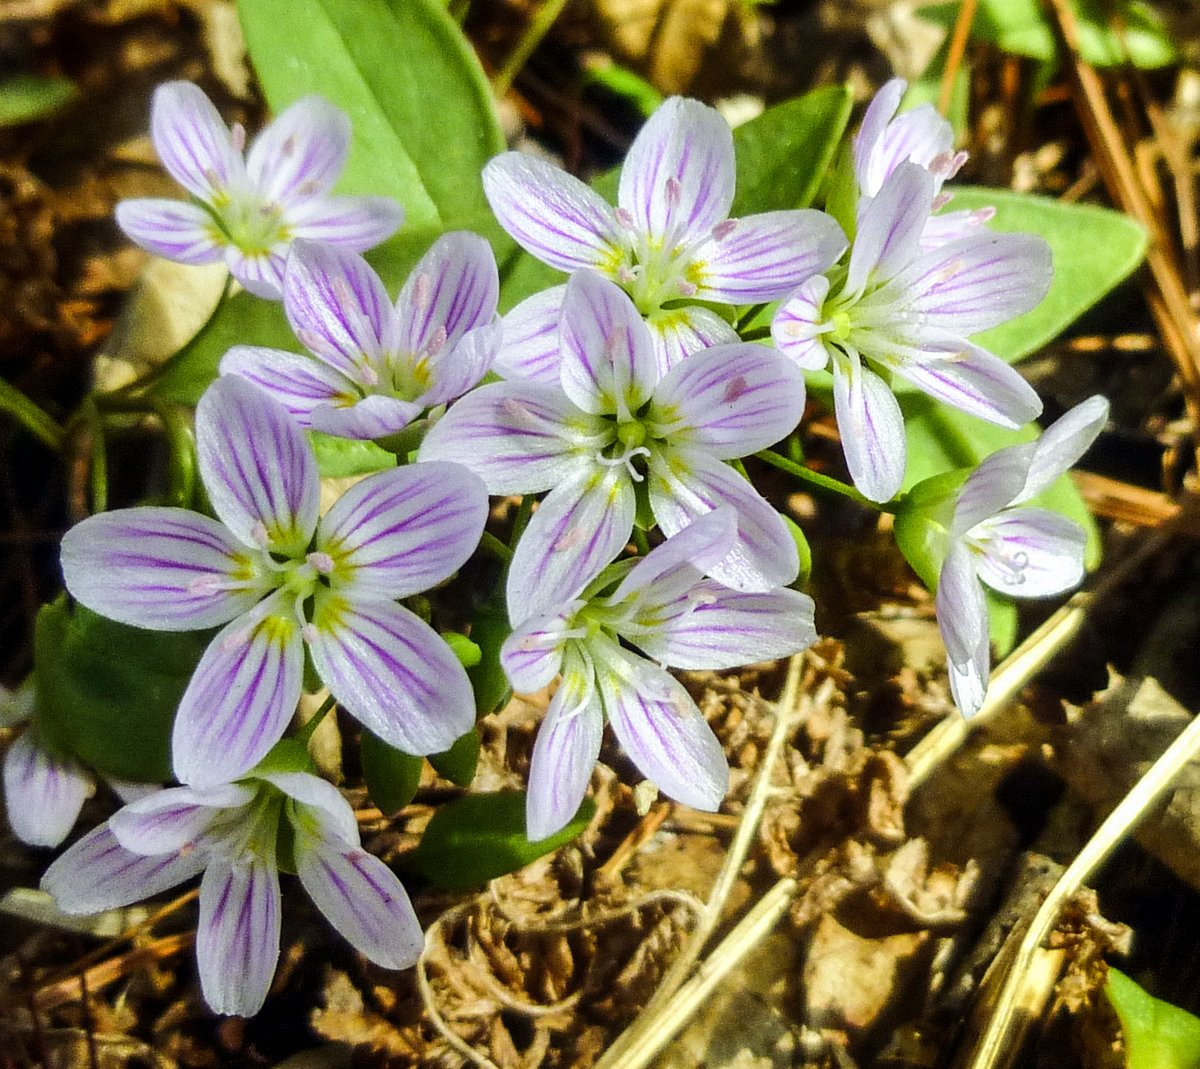 10. Spring Beauties